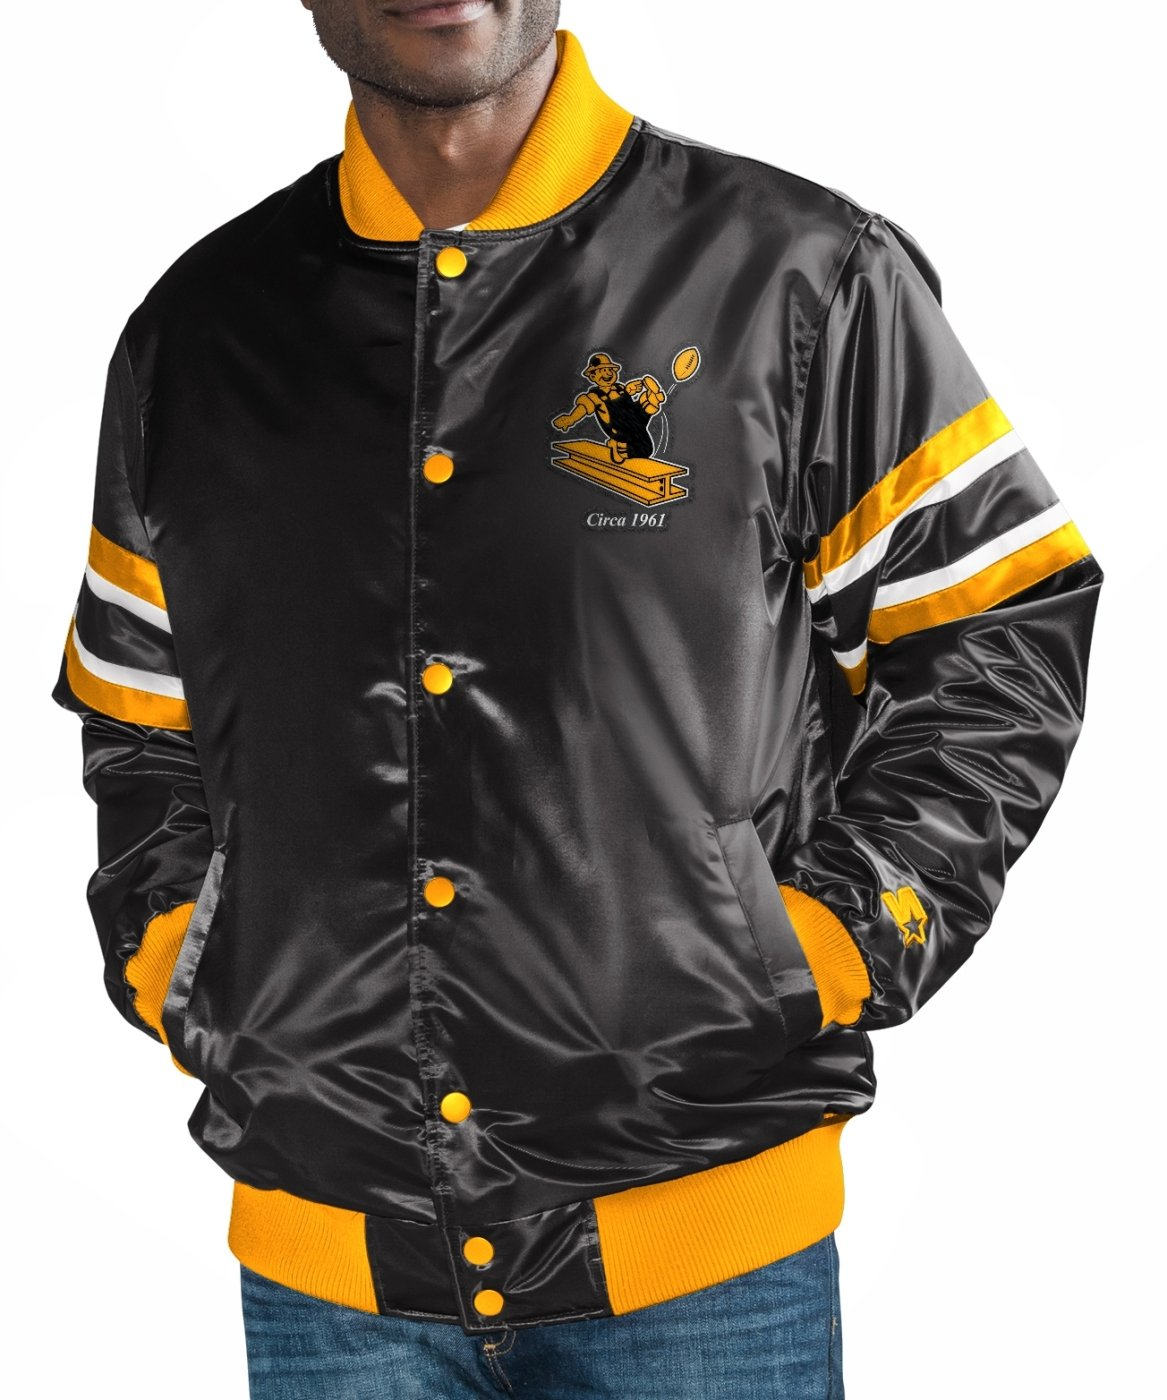 Pittsburgh Steelers nflスターター